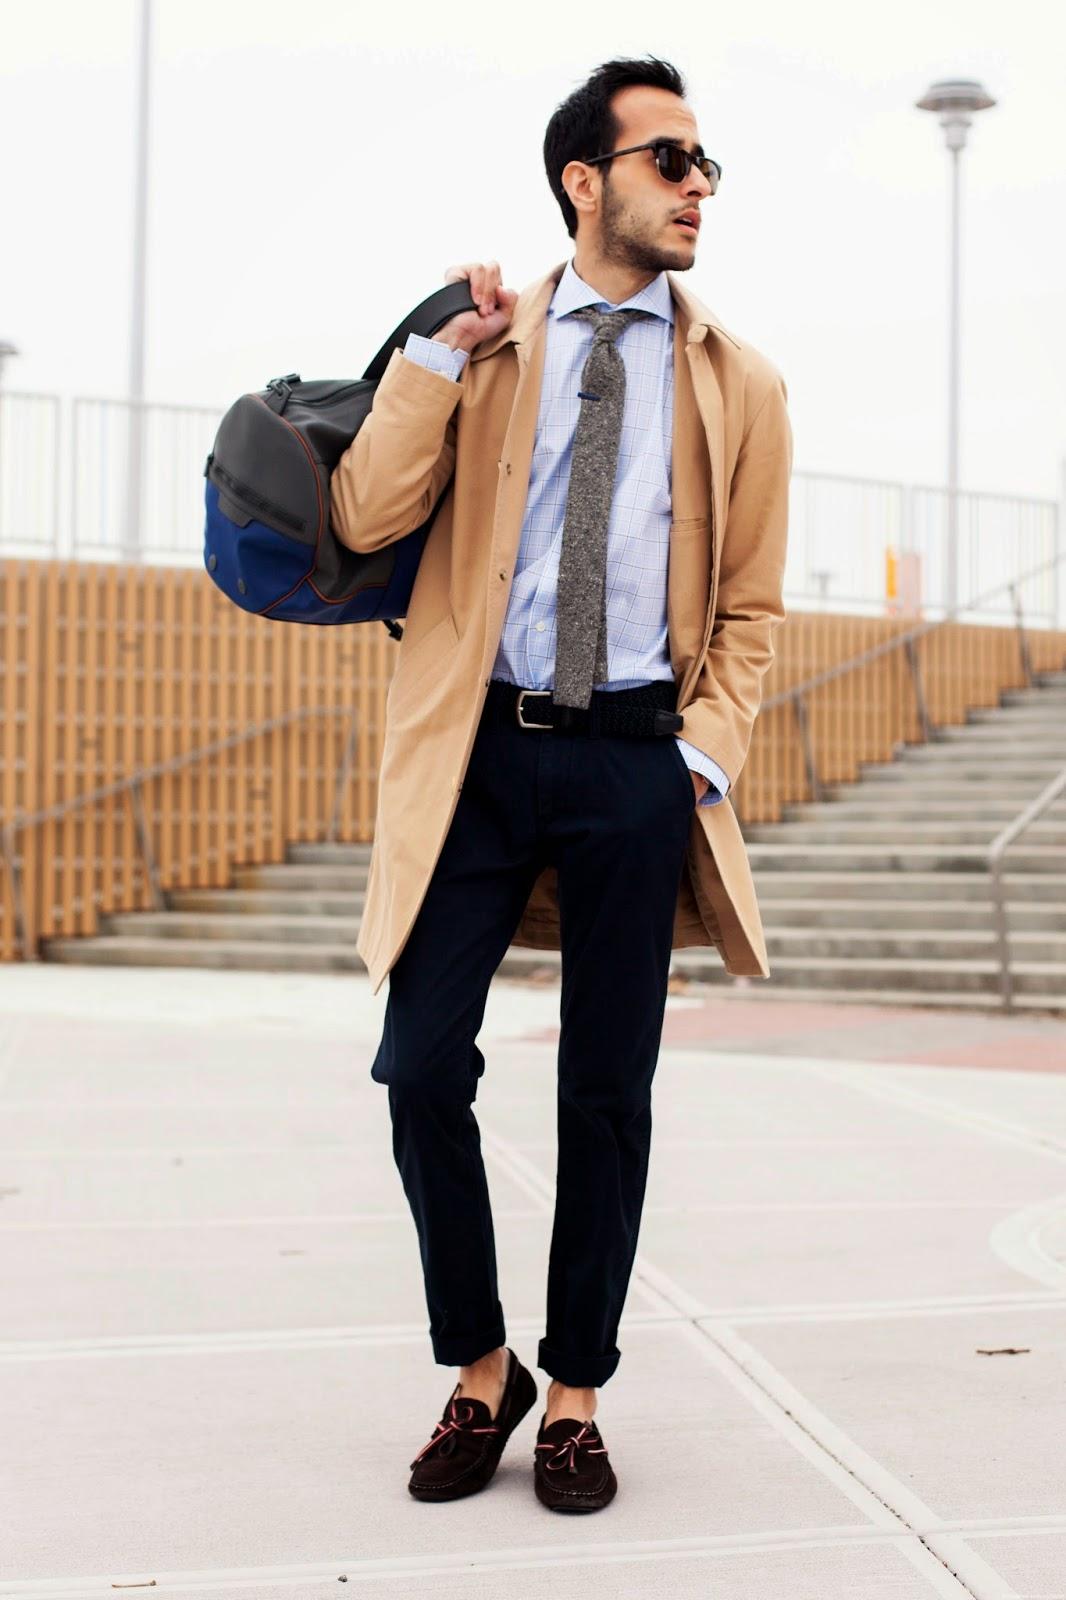 Fashion Executive, a Fashion within Fashion